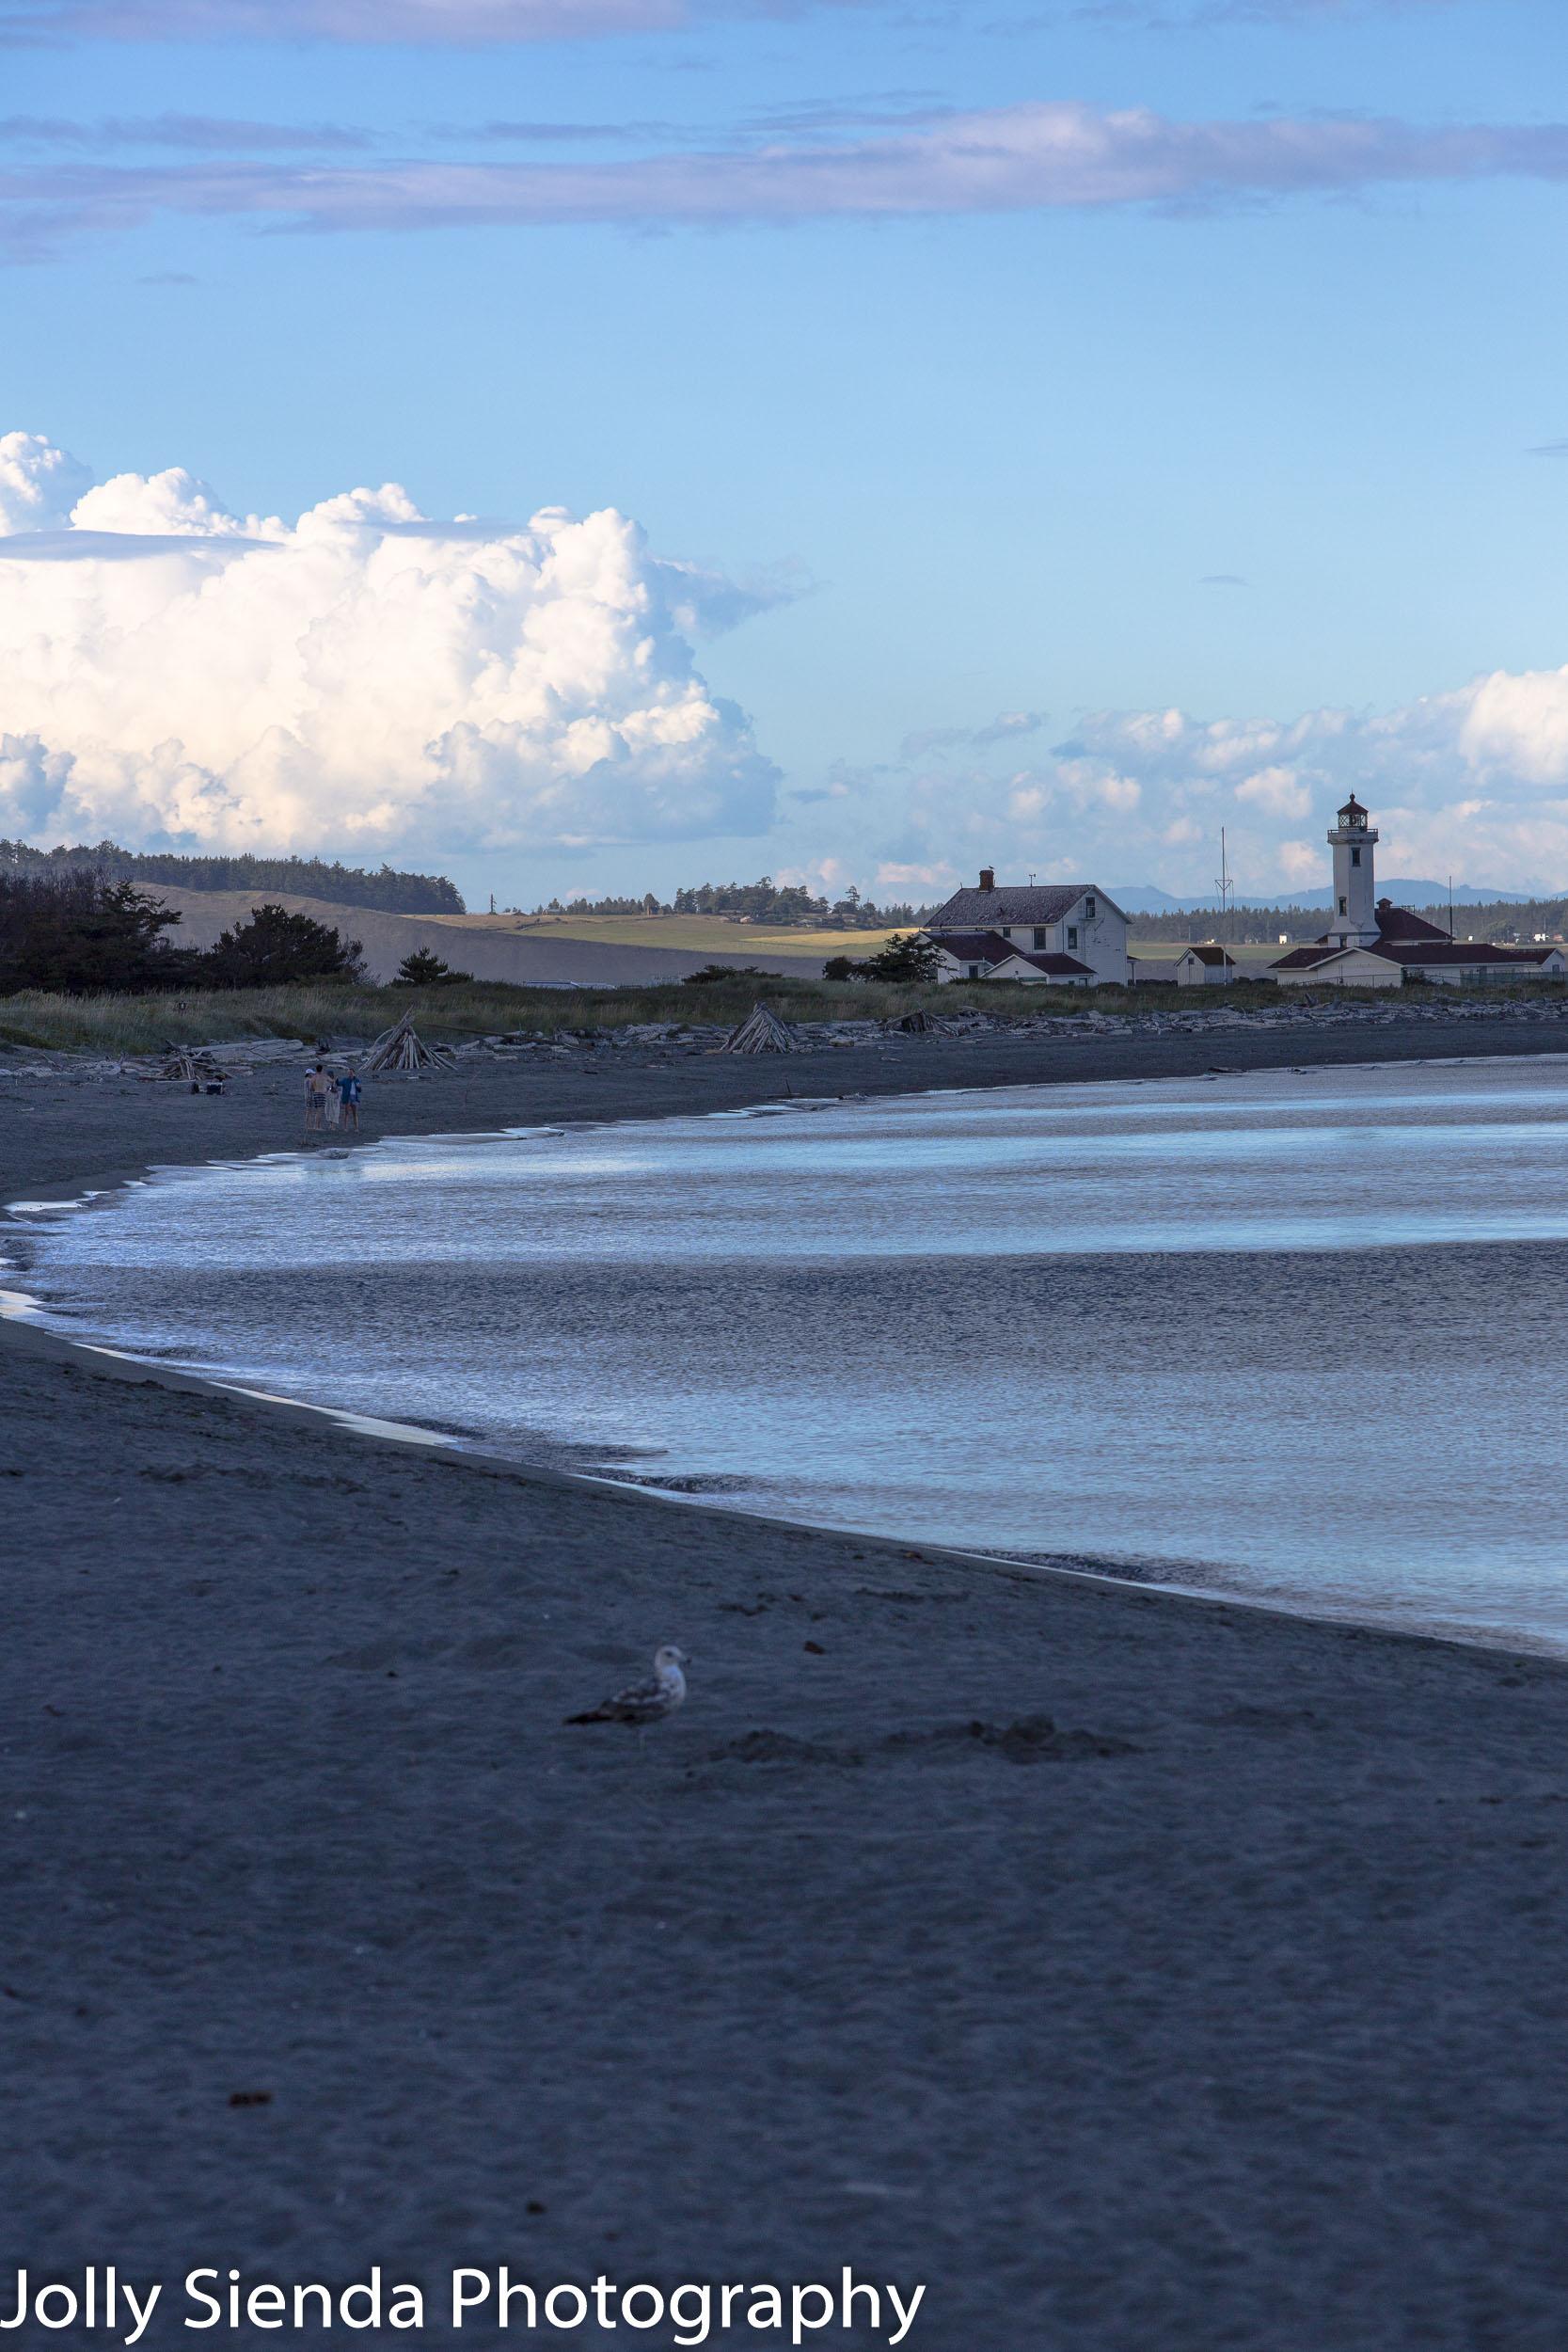 Dusk at curved beach at Point Wilson Light House